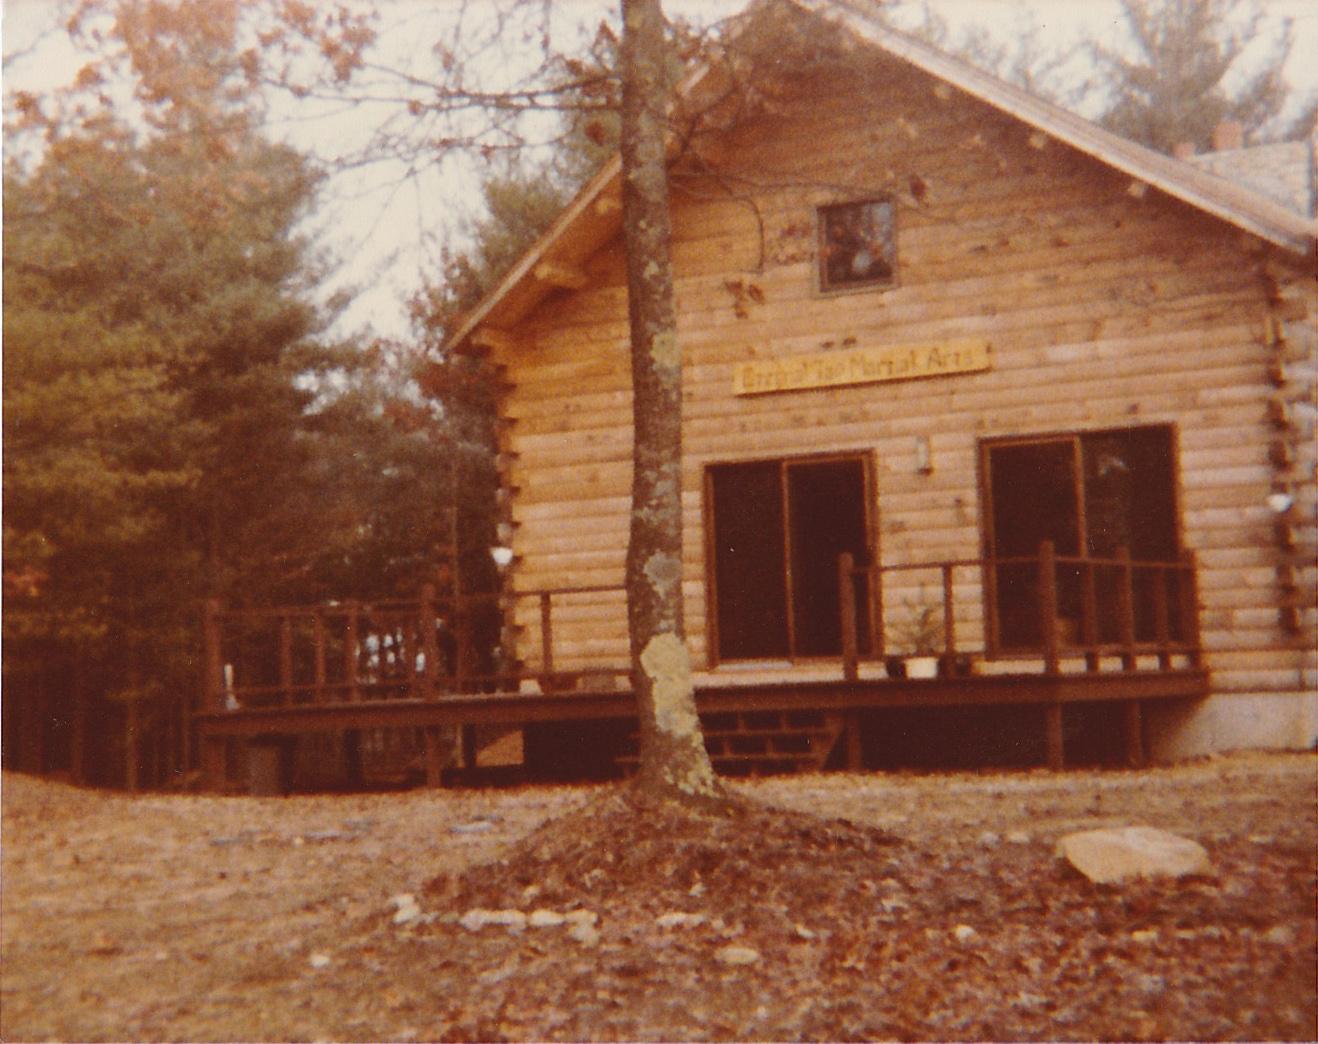 Master Paolillo's first Tao sanctuary in North Carver, MA, 1983.